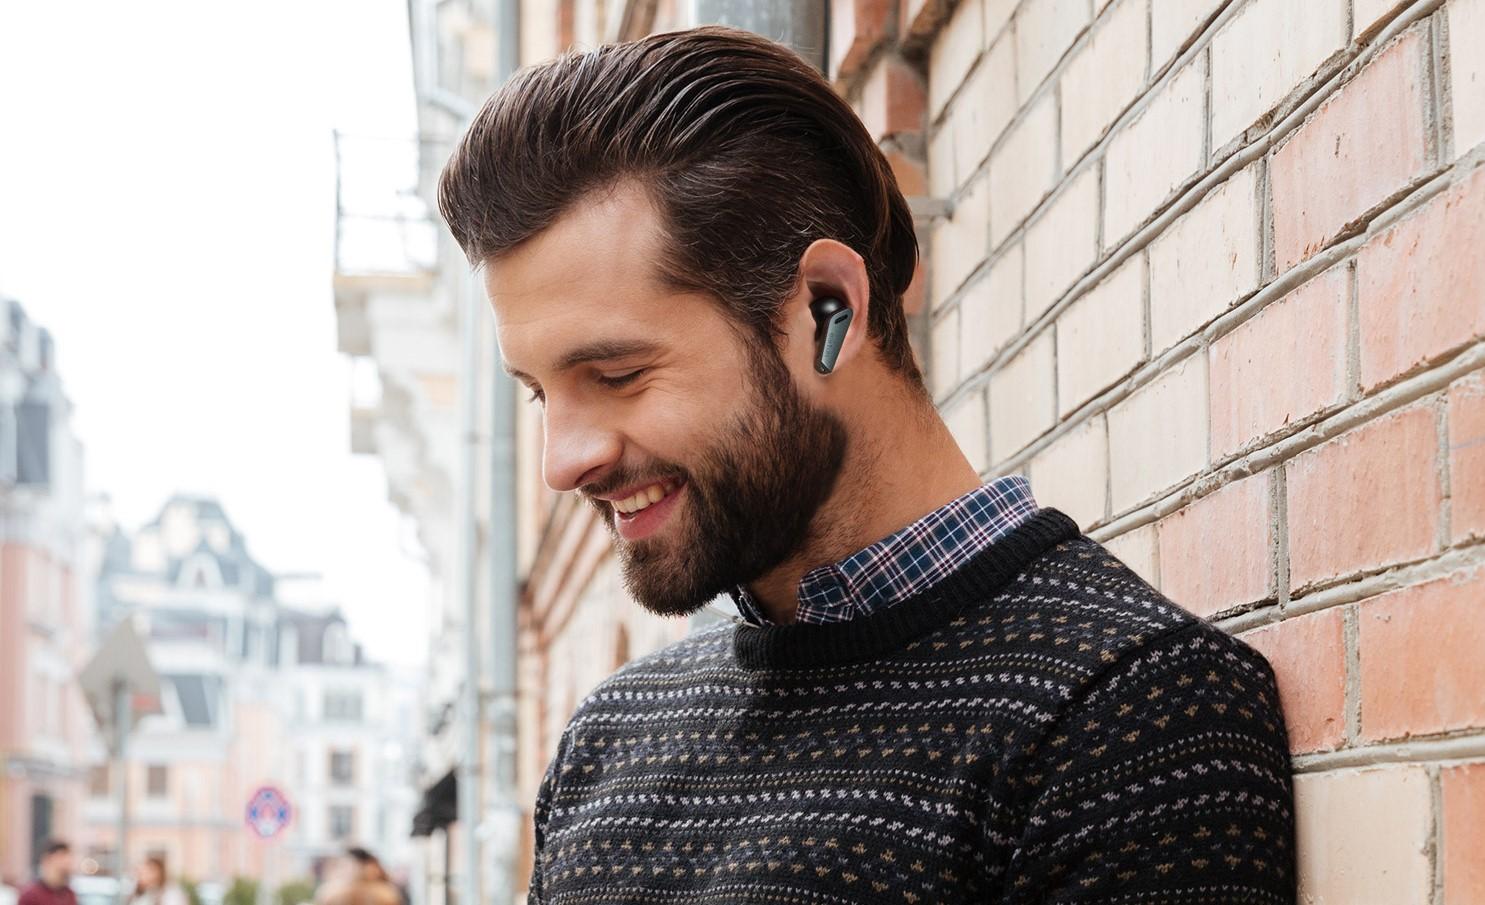 https://spy.com/wp-content/uploads/2020/12/EarFun-Air-Pro-Wireless-Earbuds-Featured-Image.jpg